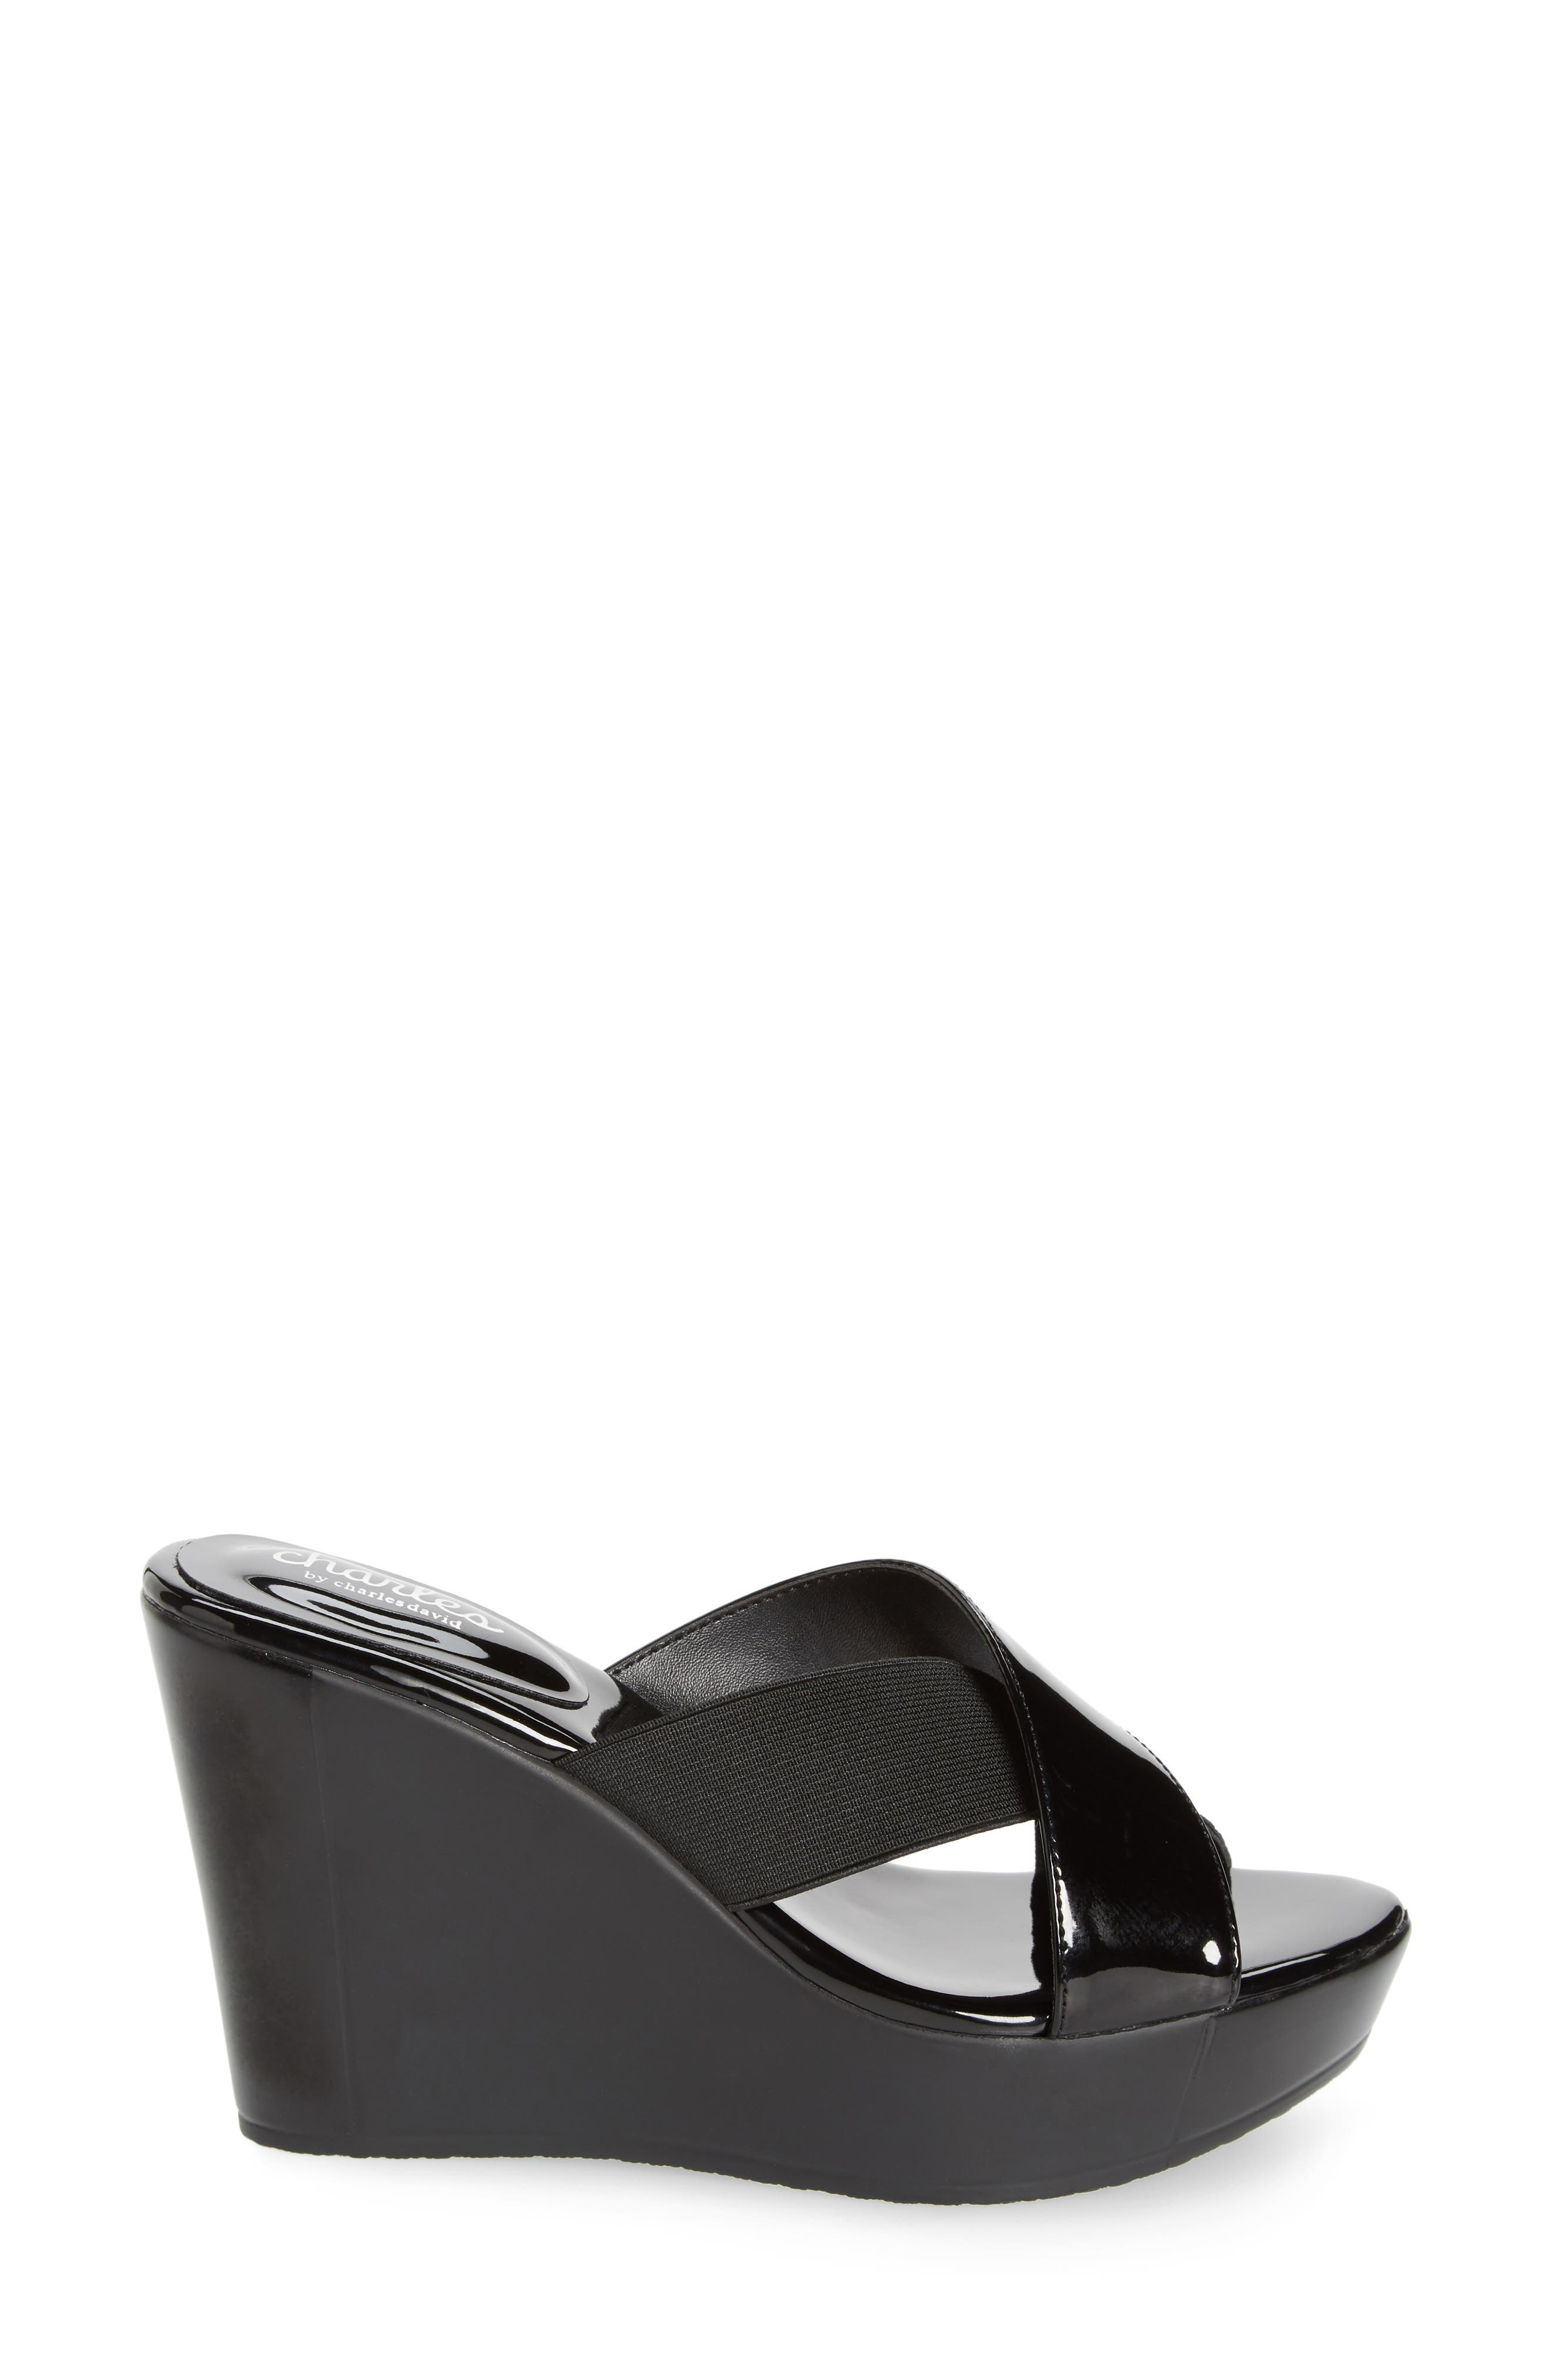 CHARLES BY CHARLES DAVID, Fuzho Platform Wedge Sandal, Alternate thumbnail 3, color, BLACK FABRIC/ FAUX PATENT